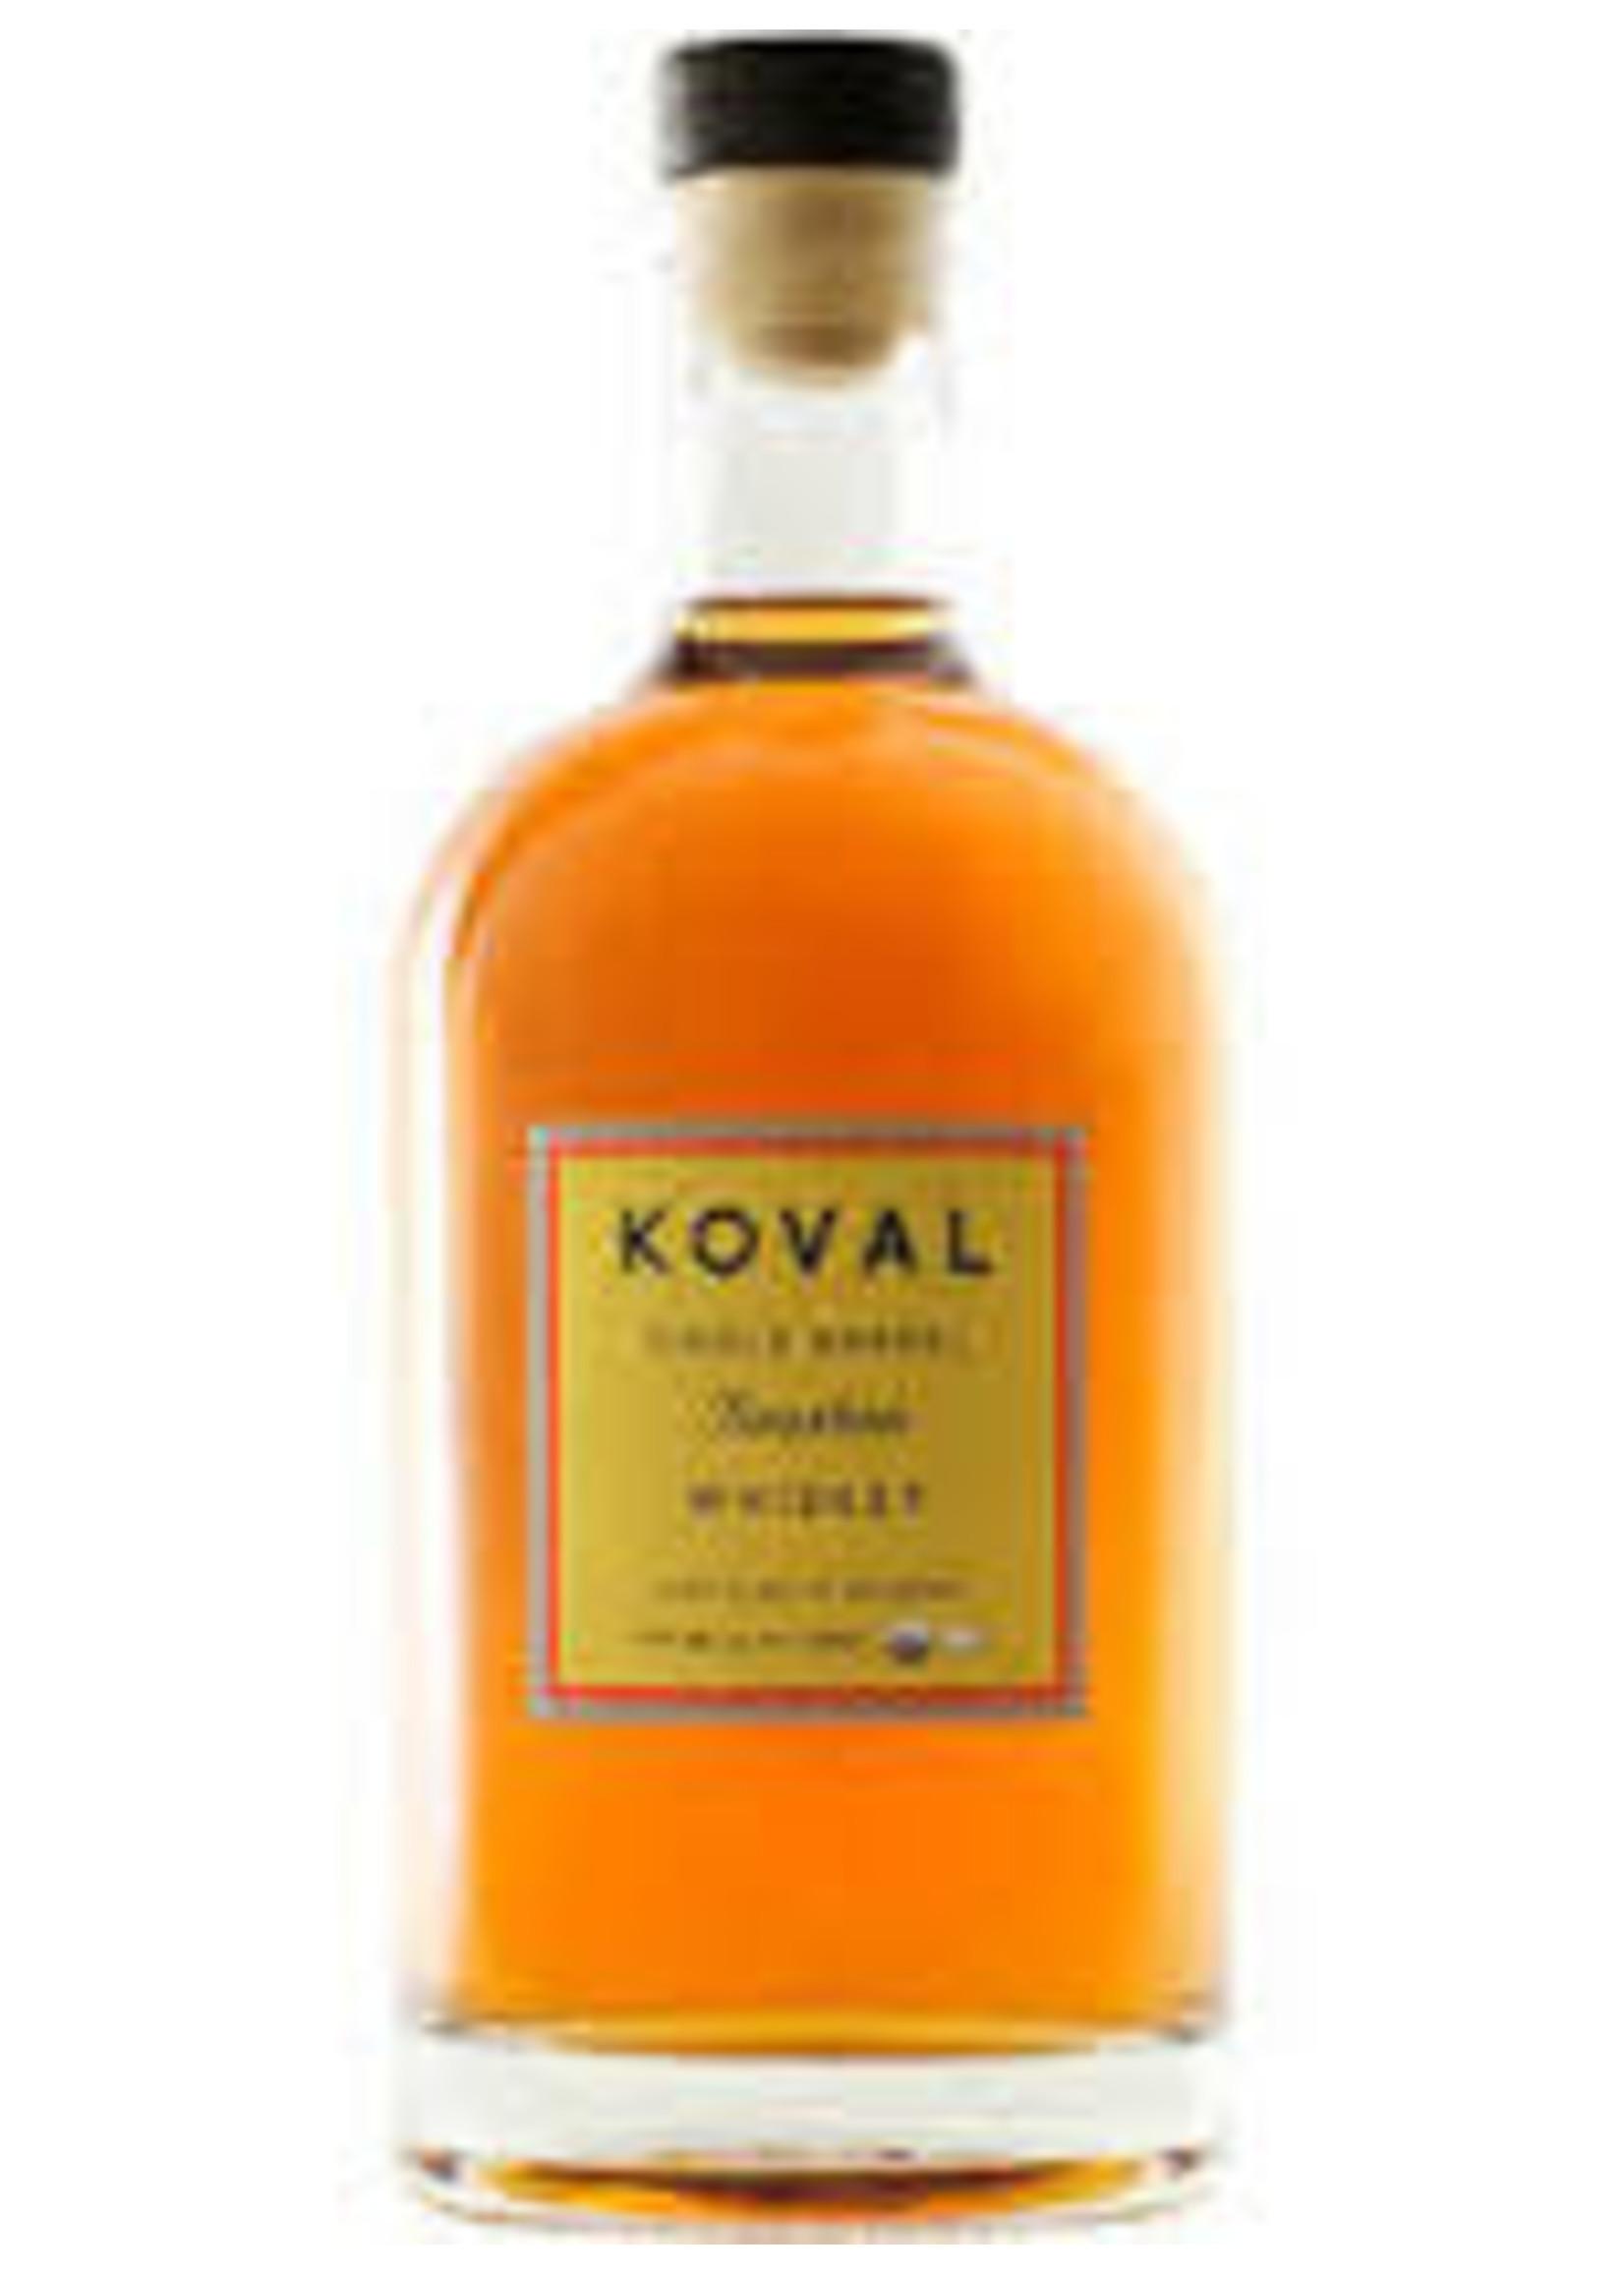 Koval Single Barrel Bourbon Whiskey Chicago 750ml